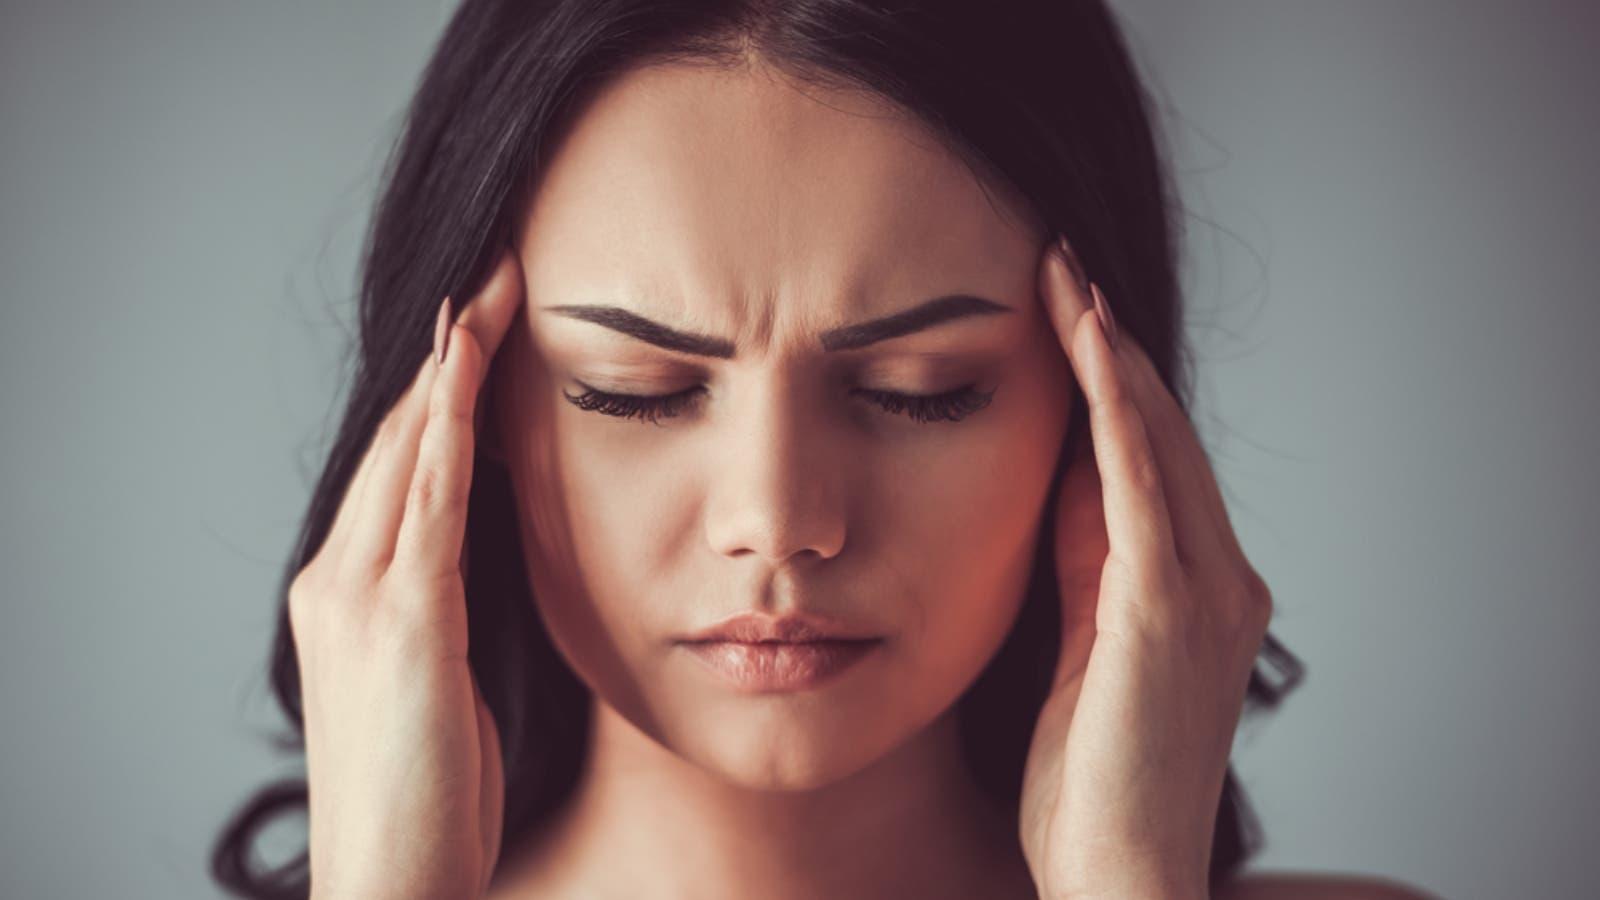 Unusual cause of headache